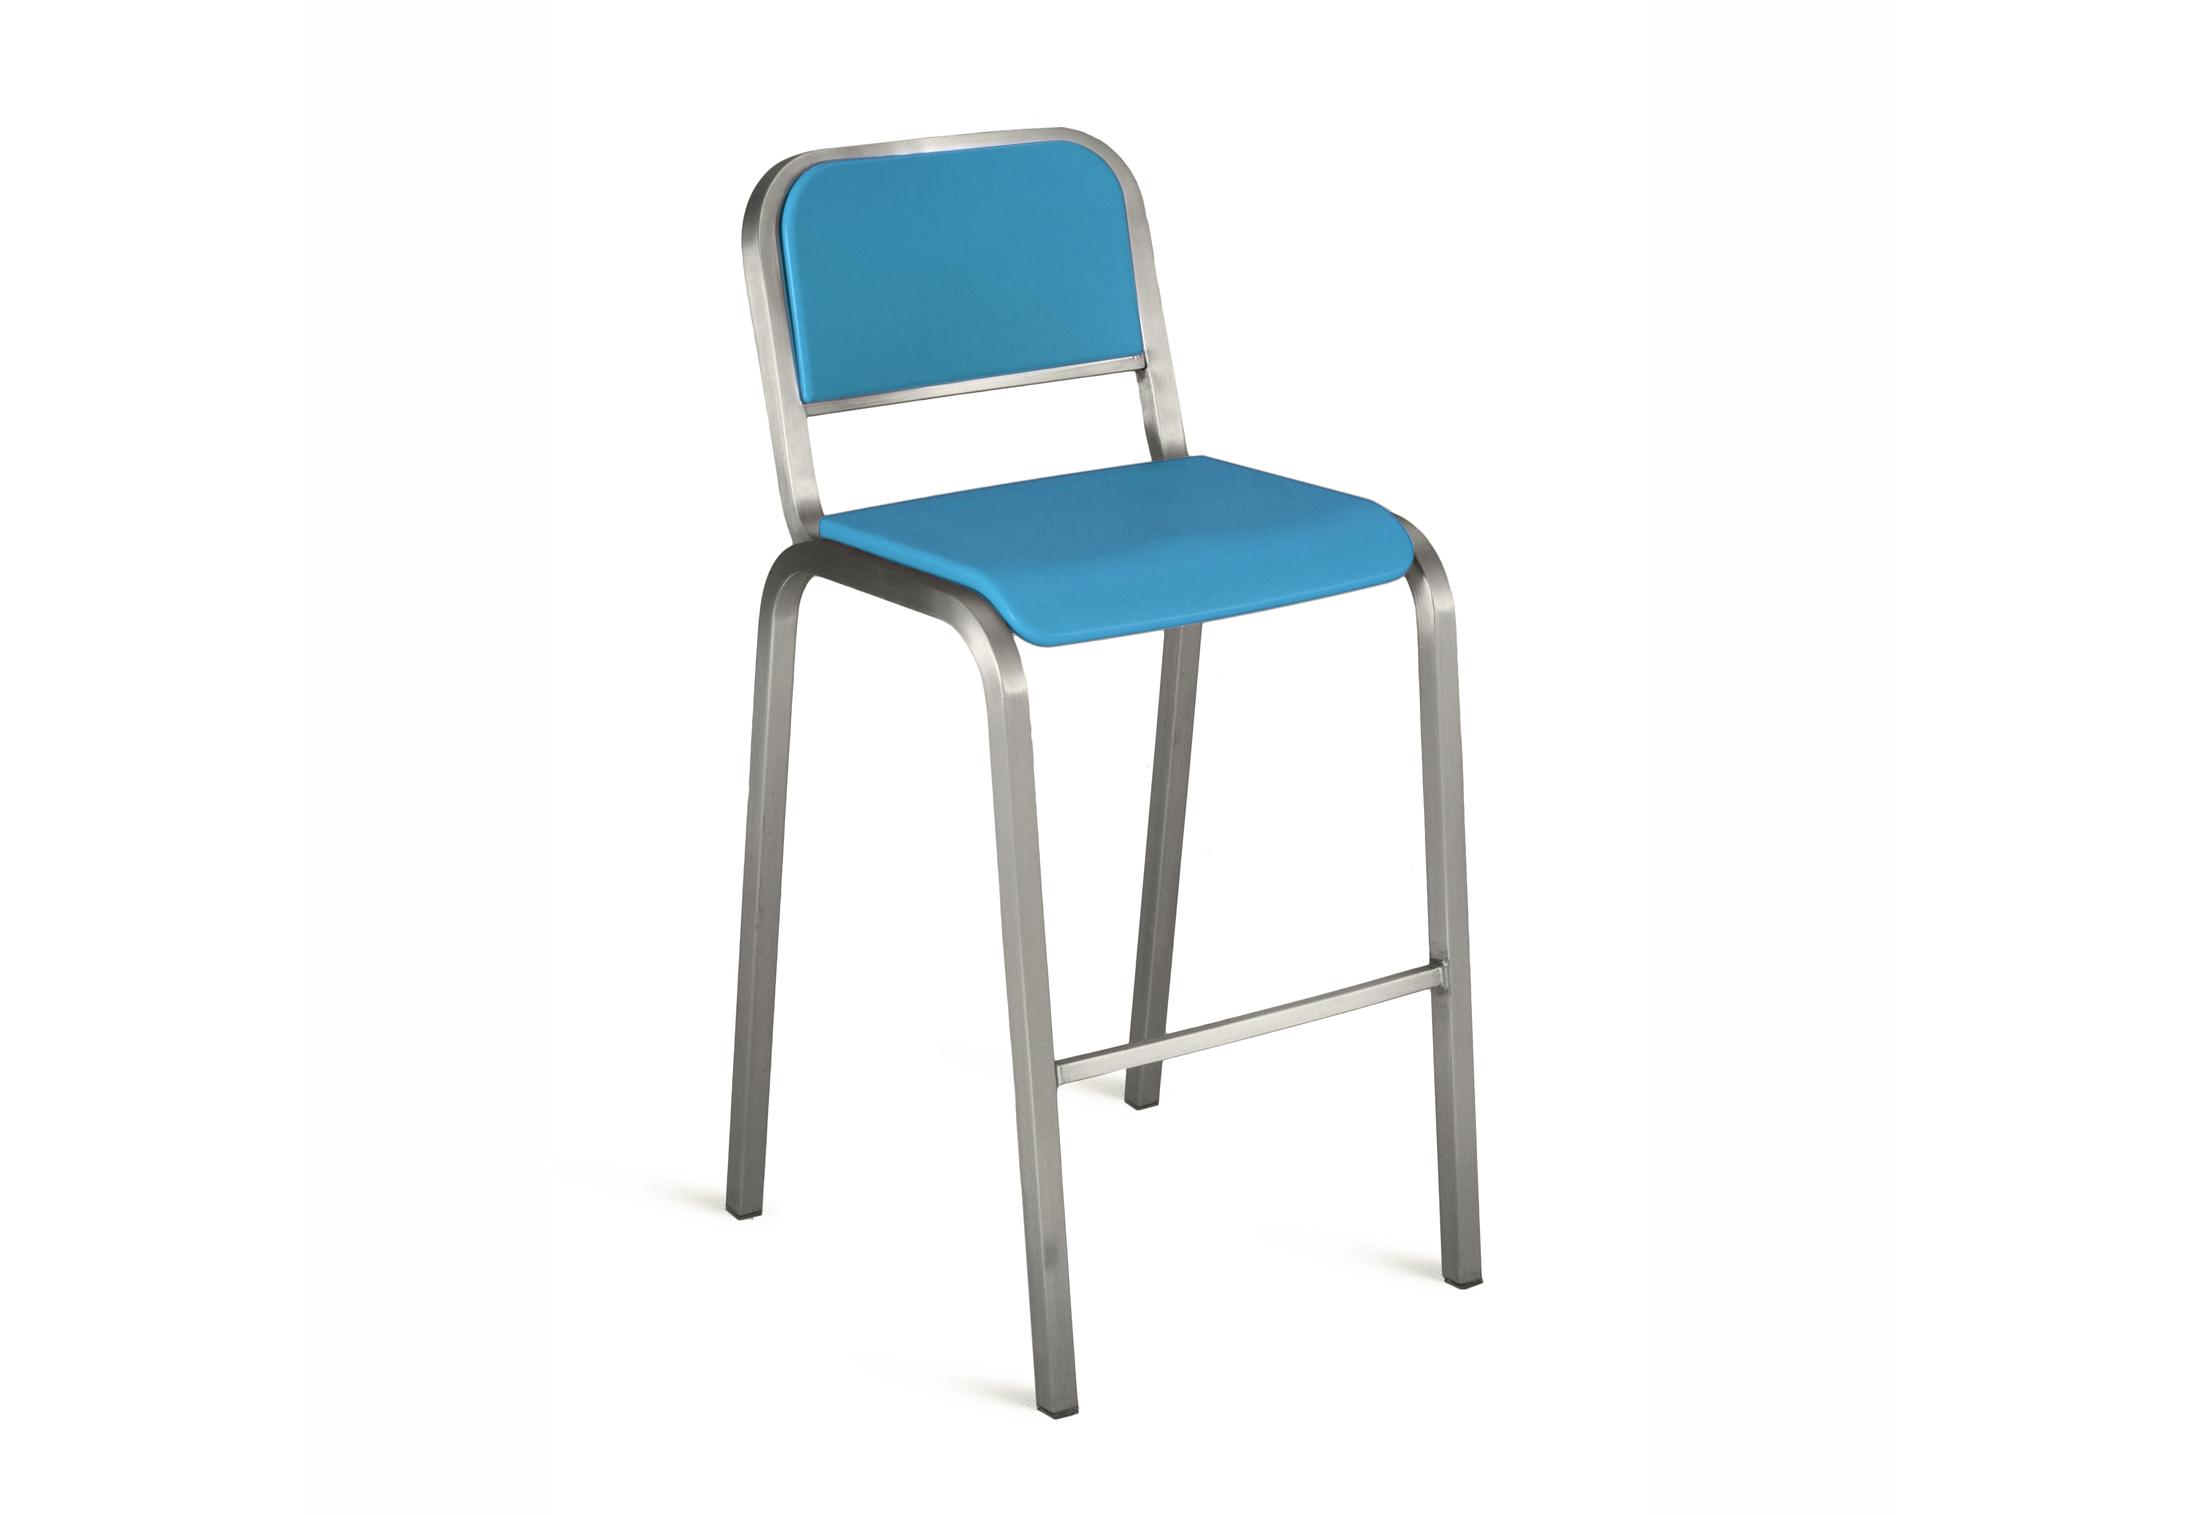 Emeco Navy Stool : nine 0 30s bar stool 2 from www.tehroony.com size 2200 x 1515 jpeg 241kB